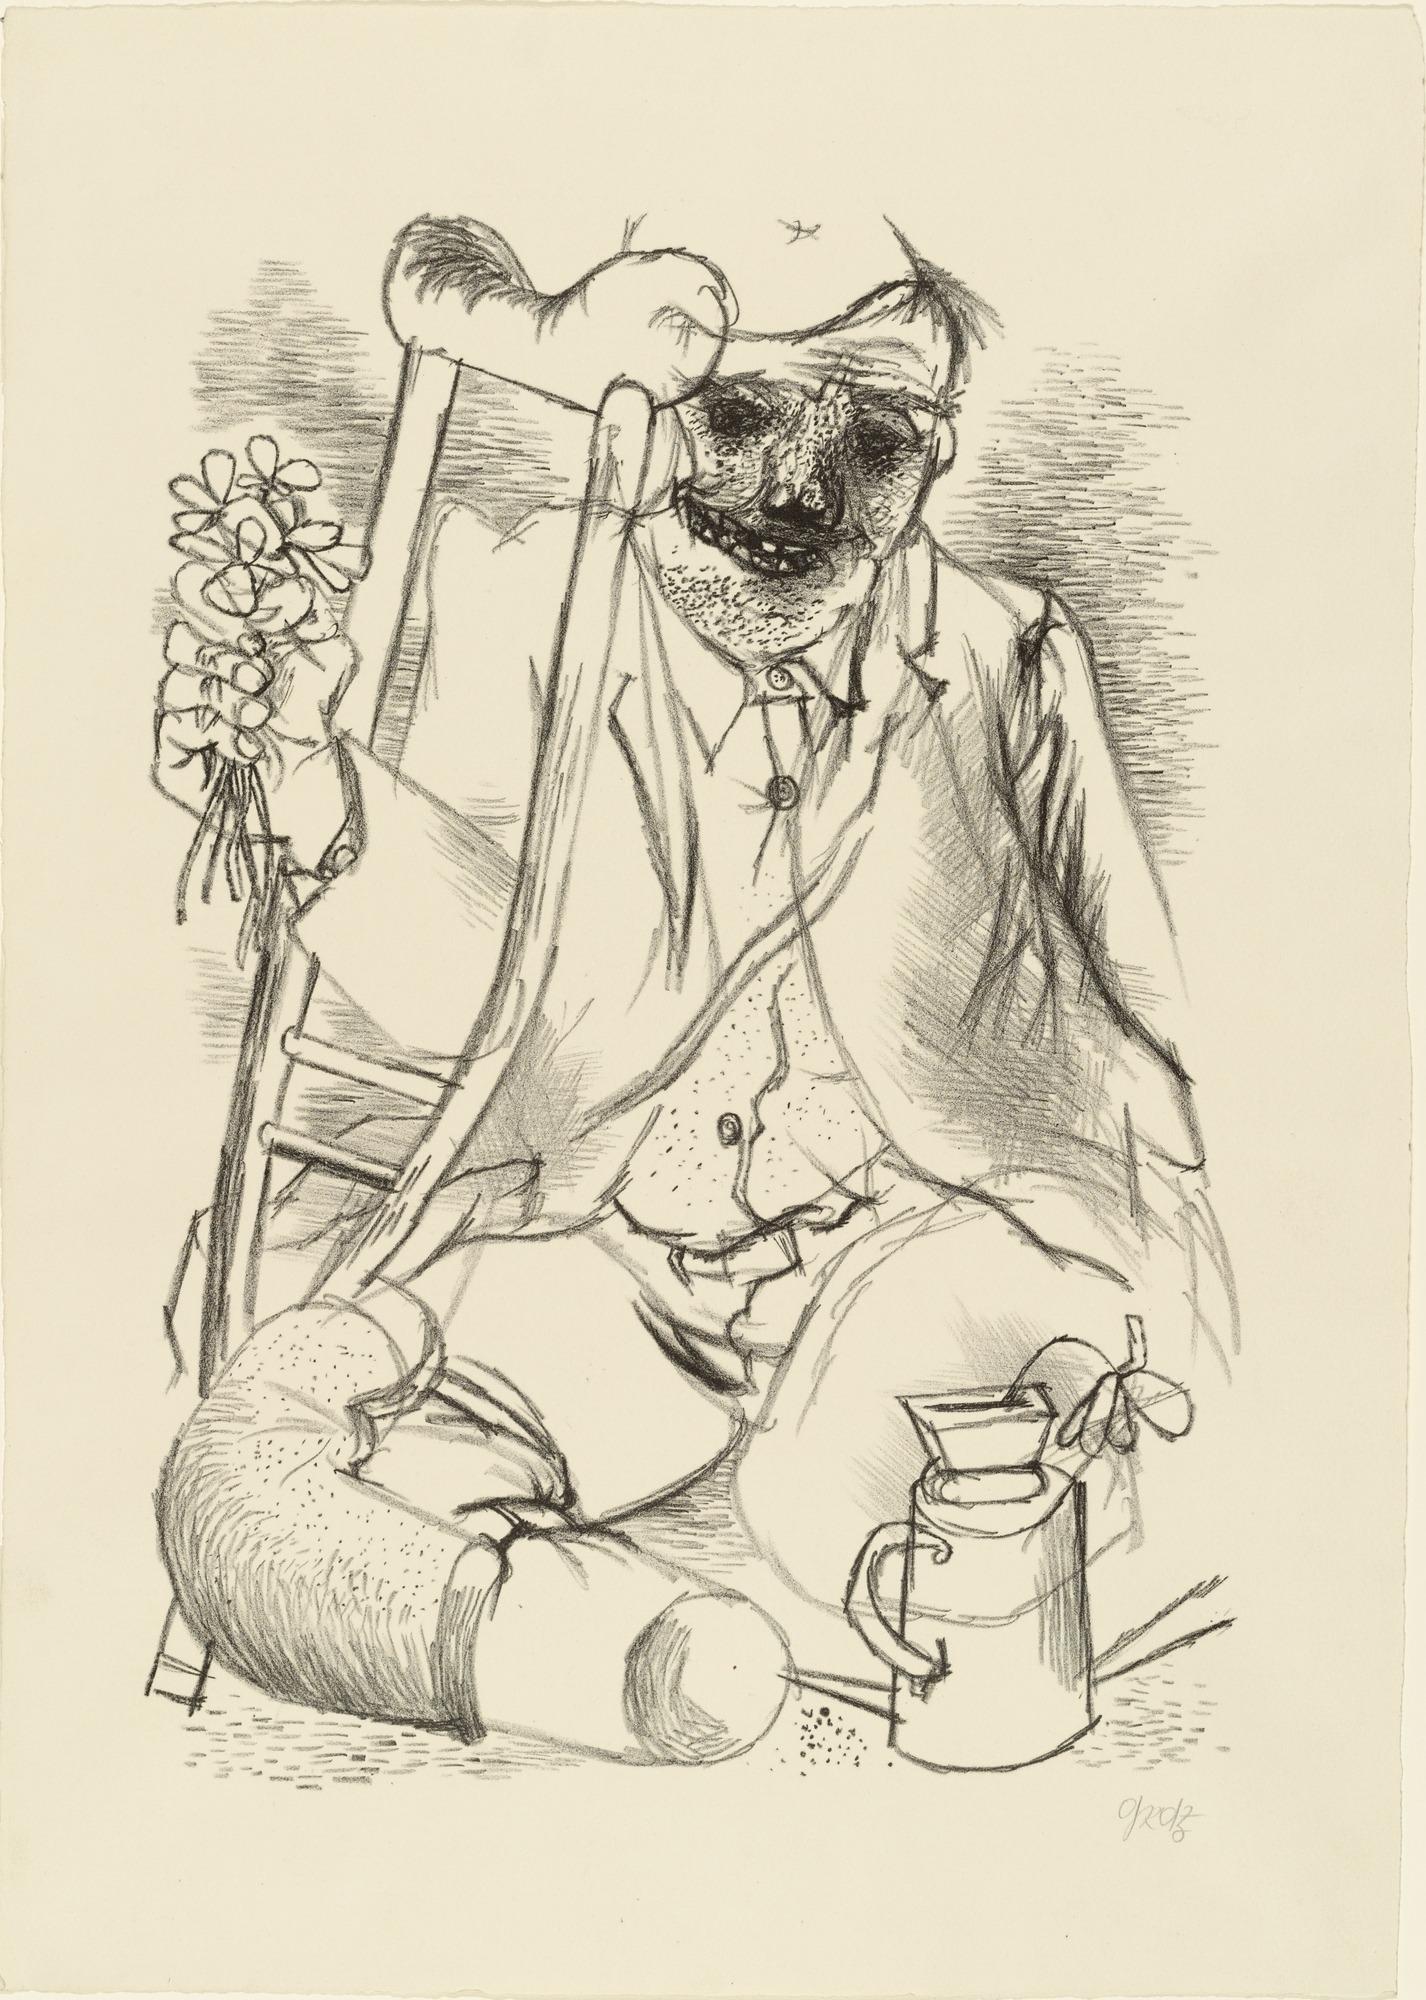 Georg Grosz, Bohater / Hero, 1935